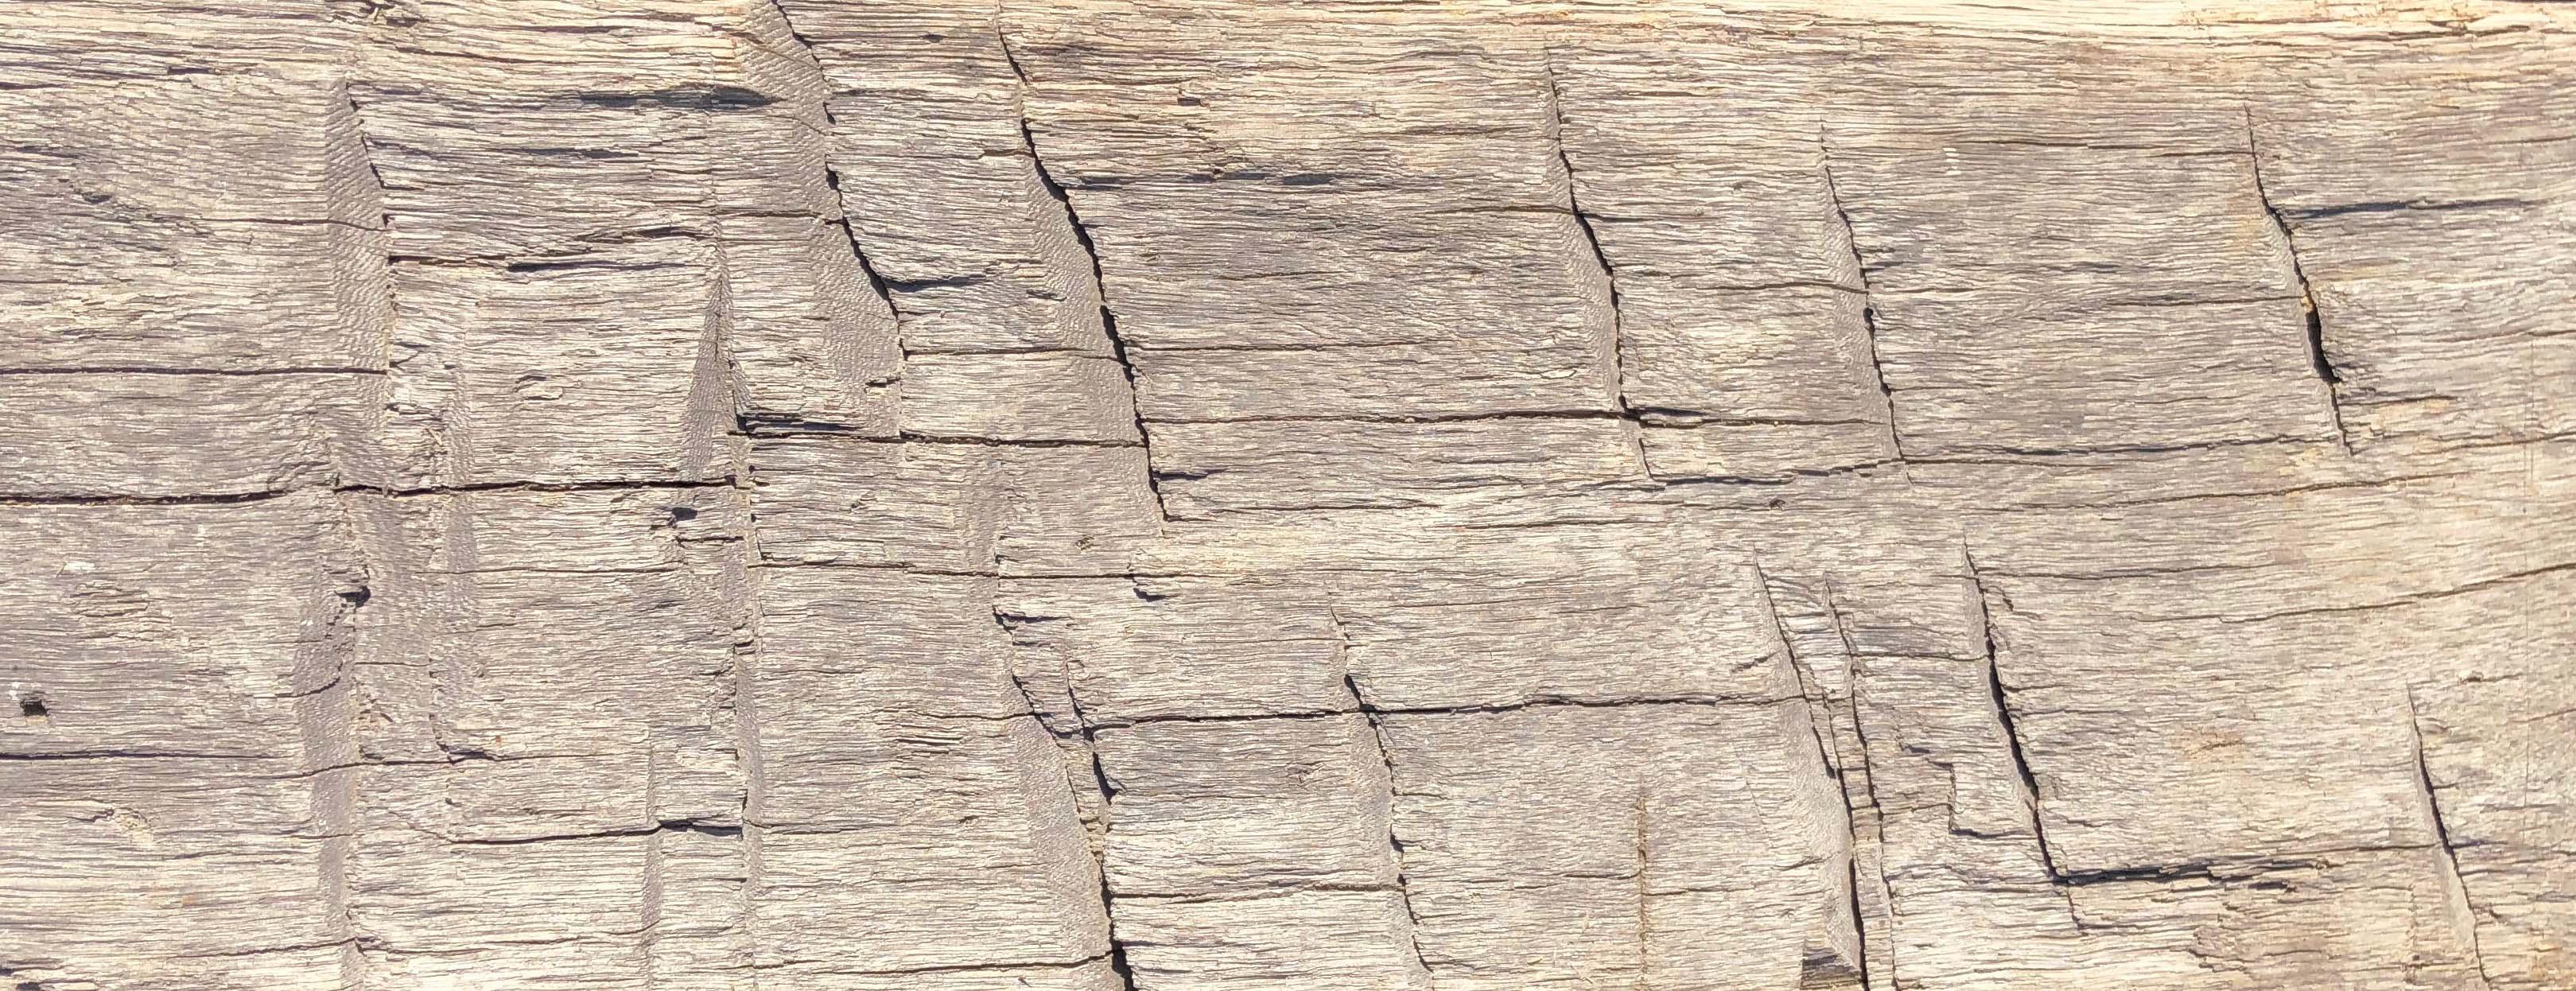 hewn hardwood beams04 - Reclaimed Hardwood Barn Timbers